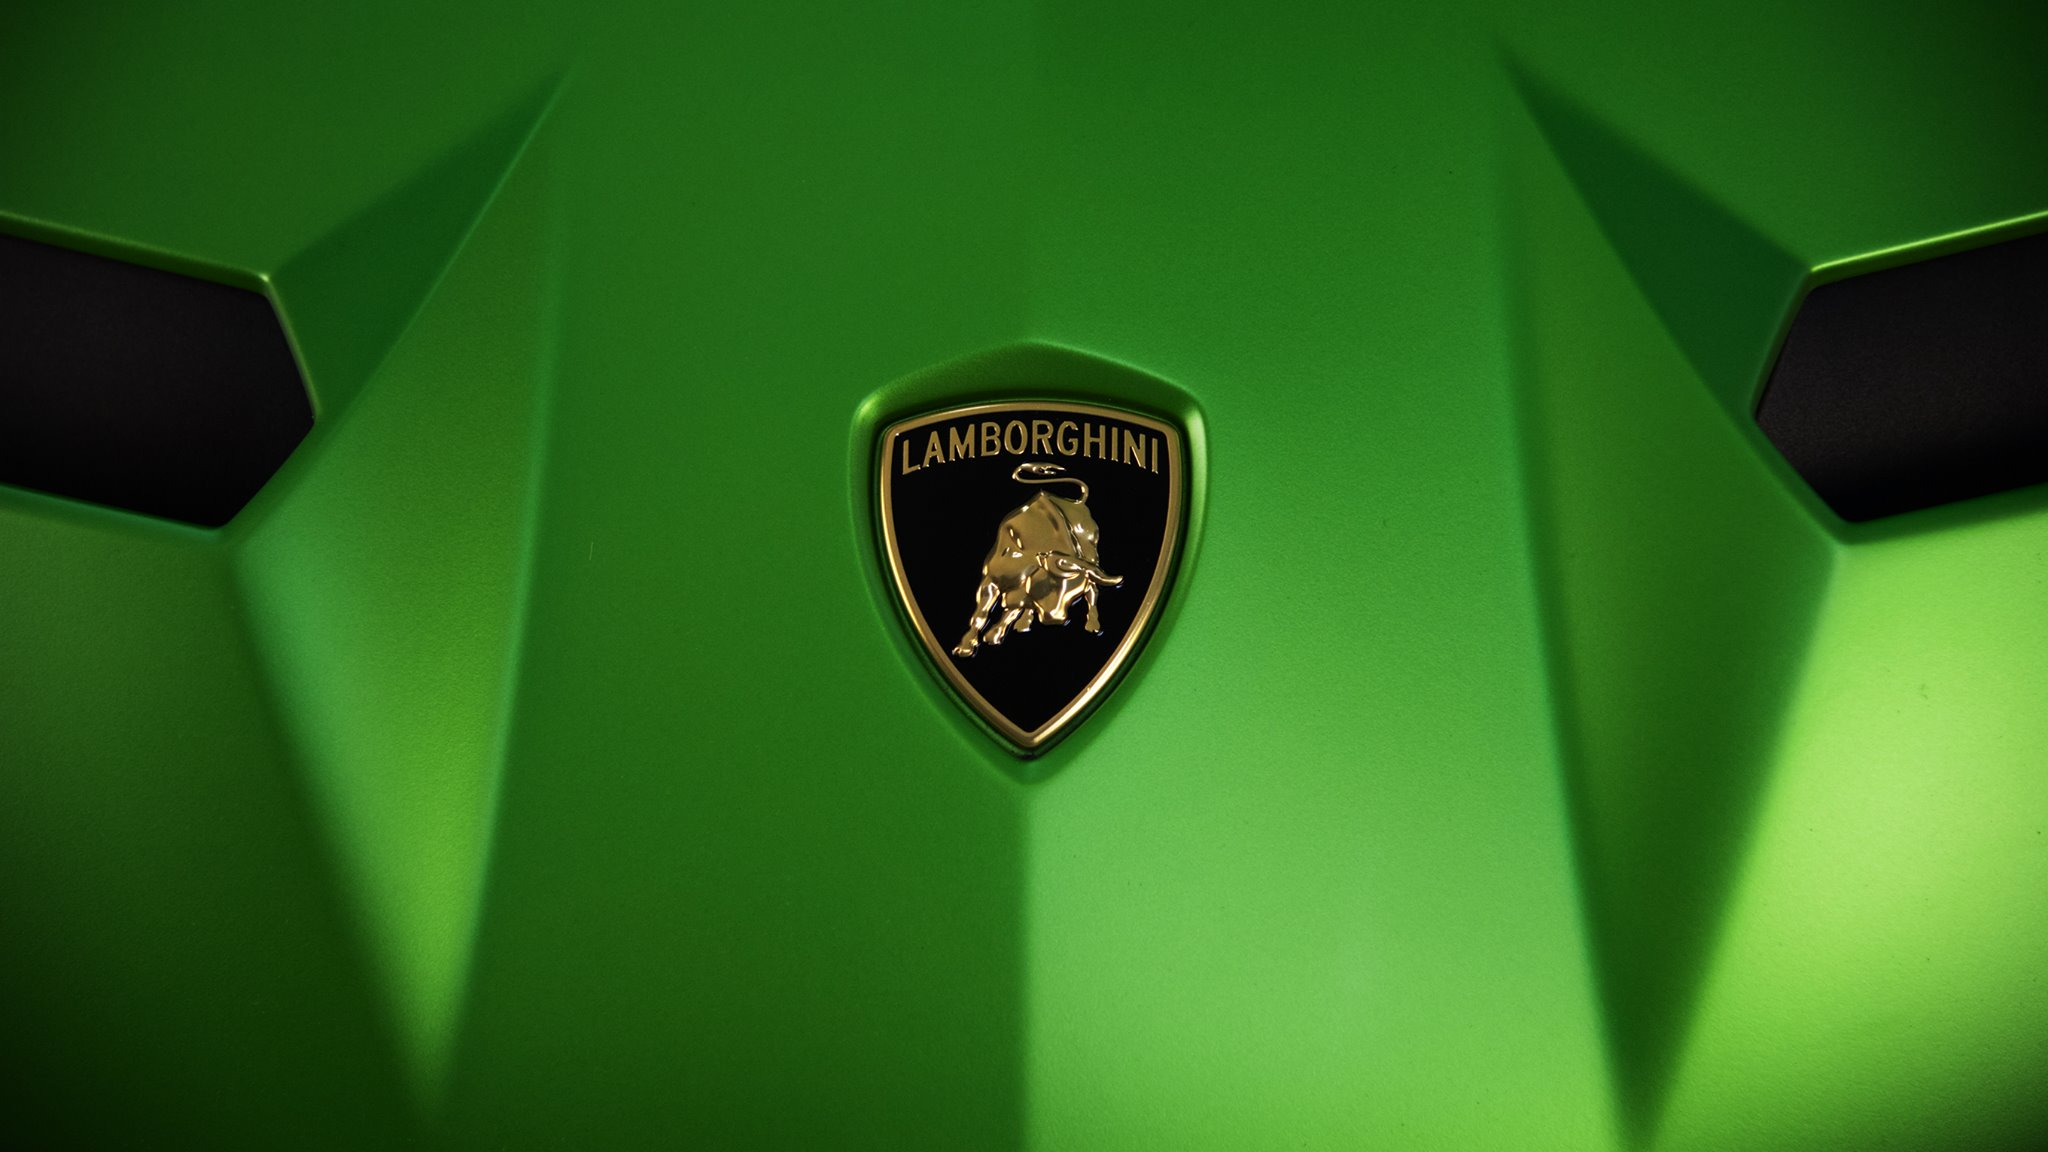 Lamborghini Aventador Sv J Teased In New Photo Gtspirit